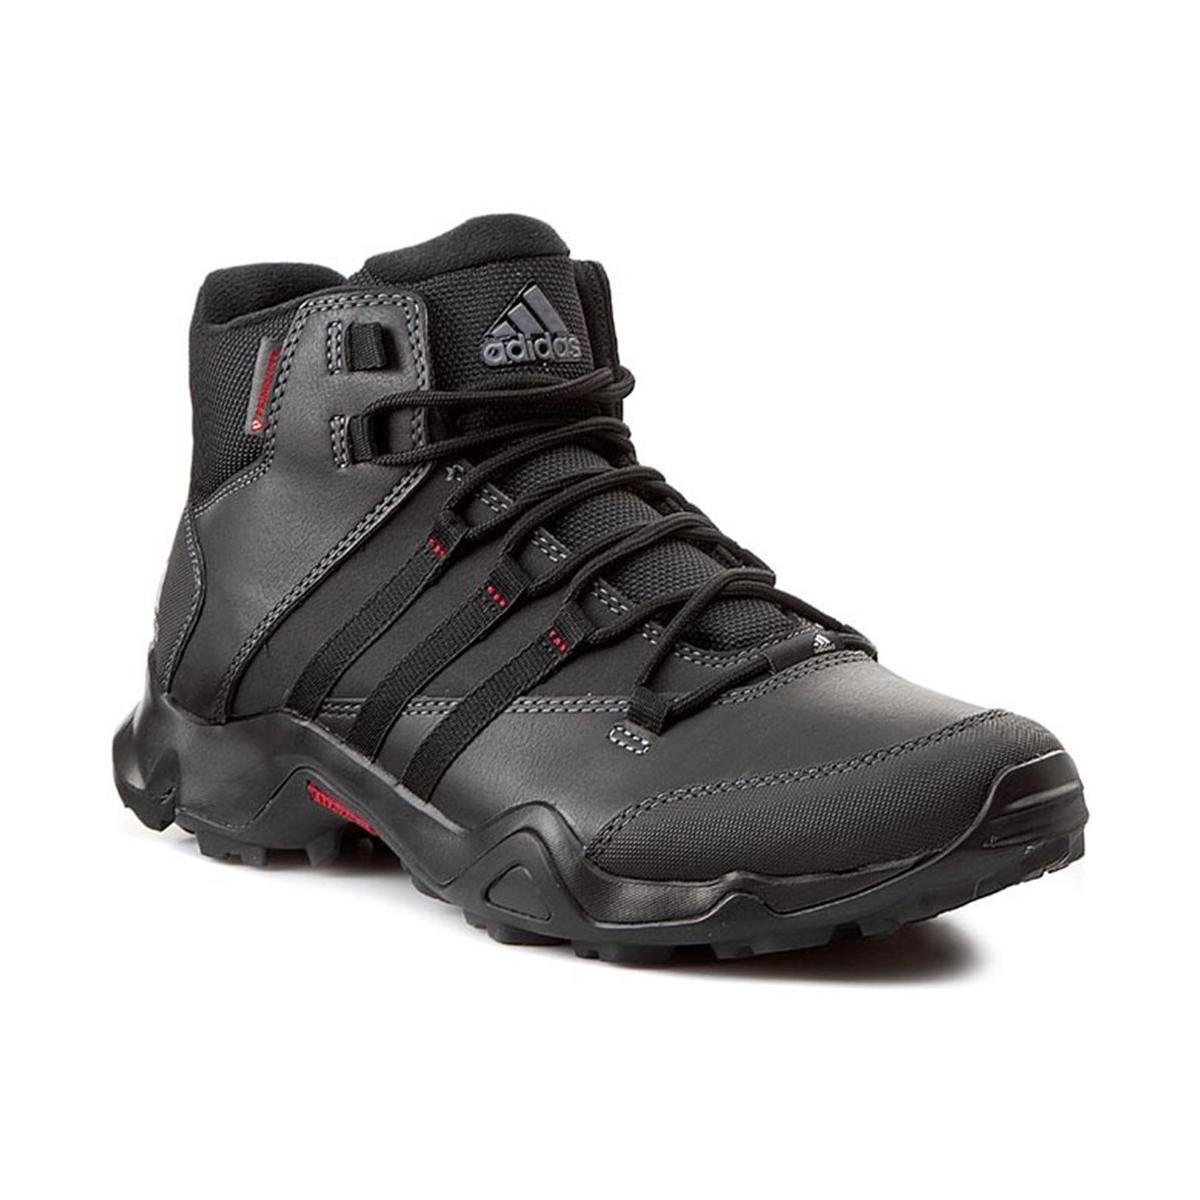 0810d3305fe28 adidas Cw Ax2 Beta Mid Men s Walking Boots In Black in Black for Men ...